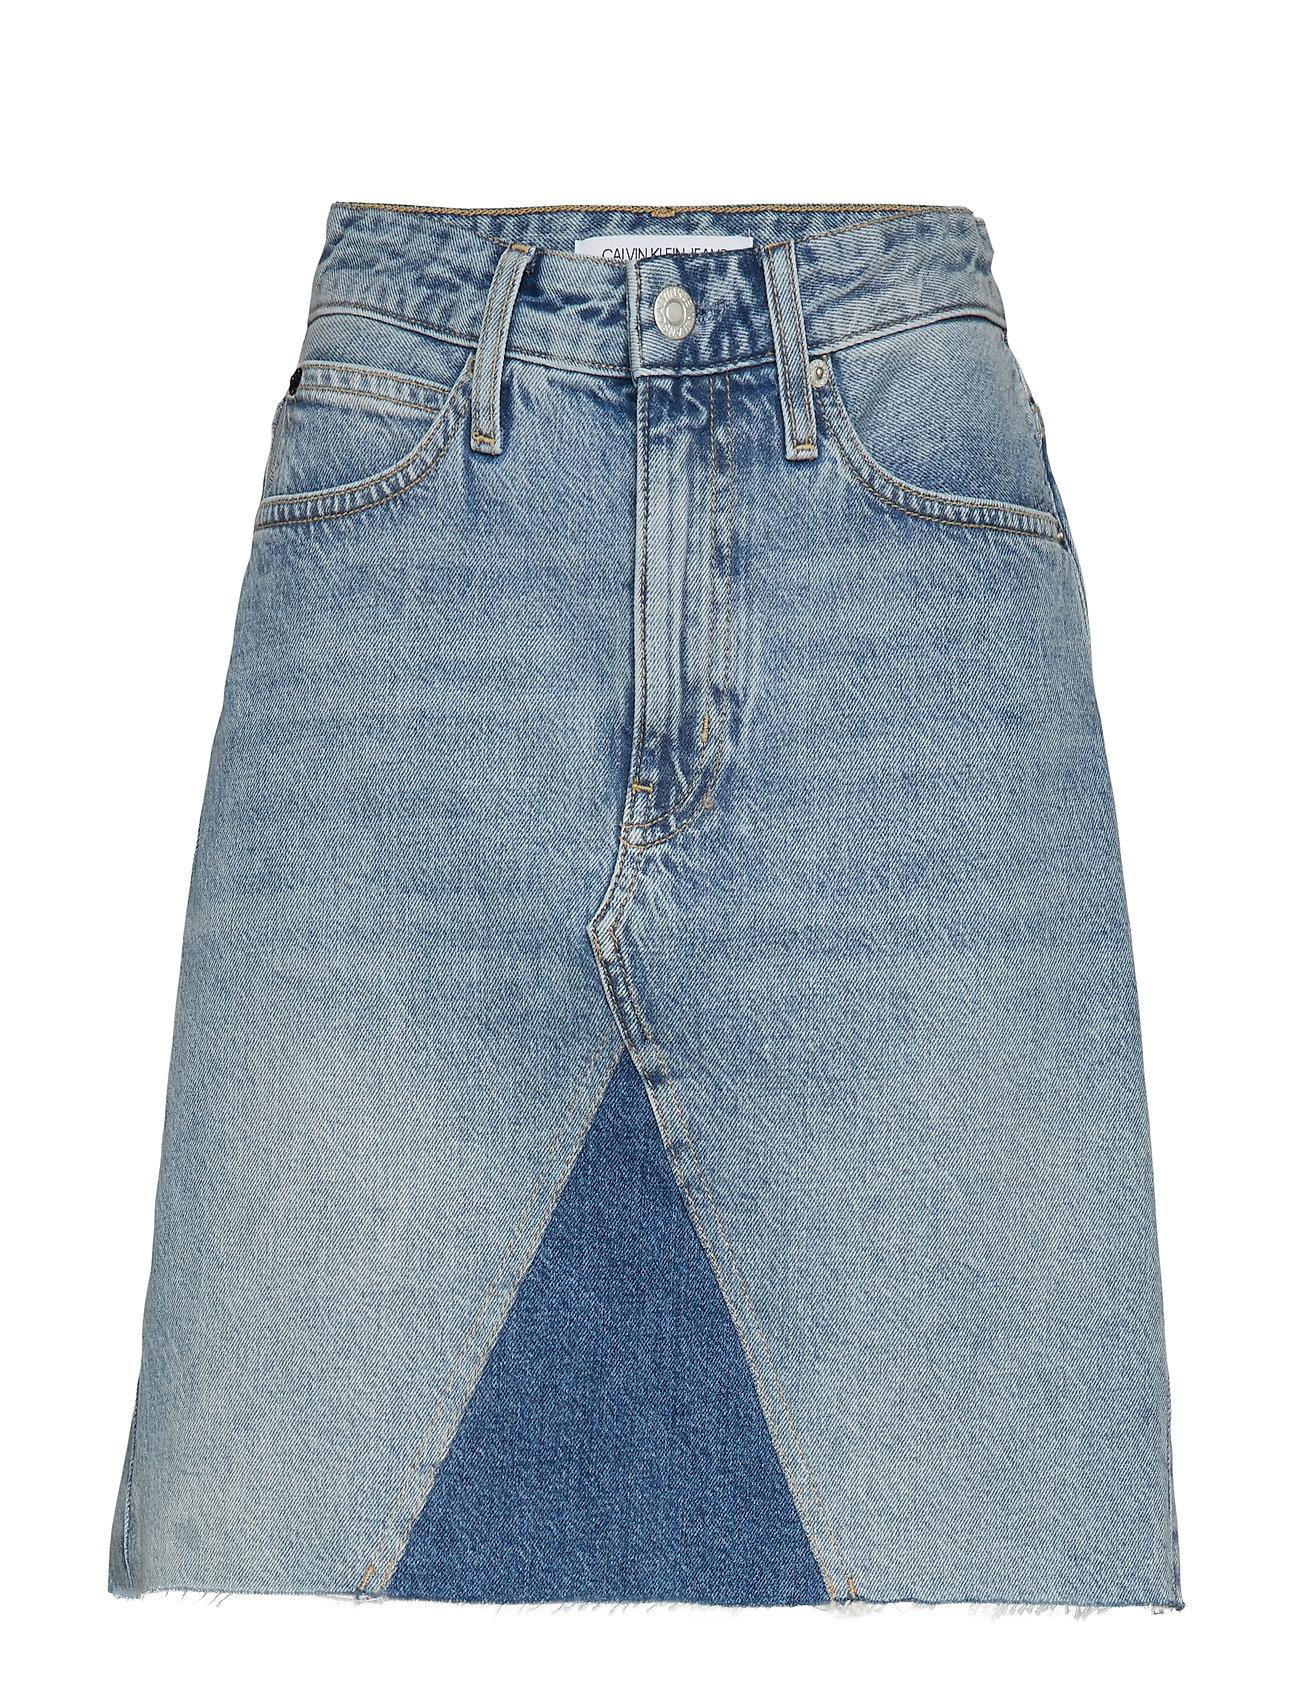 Calvin Klein Jeans MID RISE MINI SKIRT, - AA035 LIGHT BLUE WITH PRAIRIE